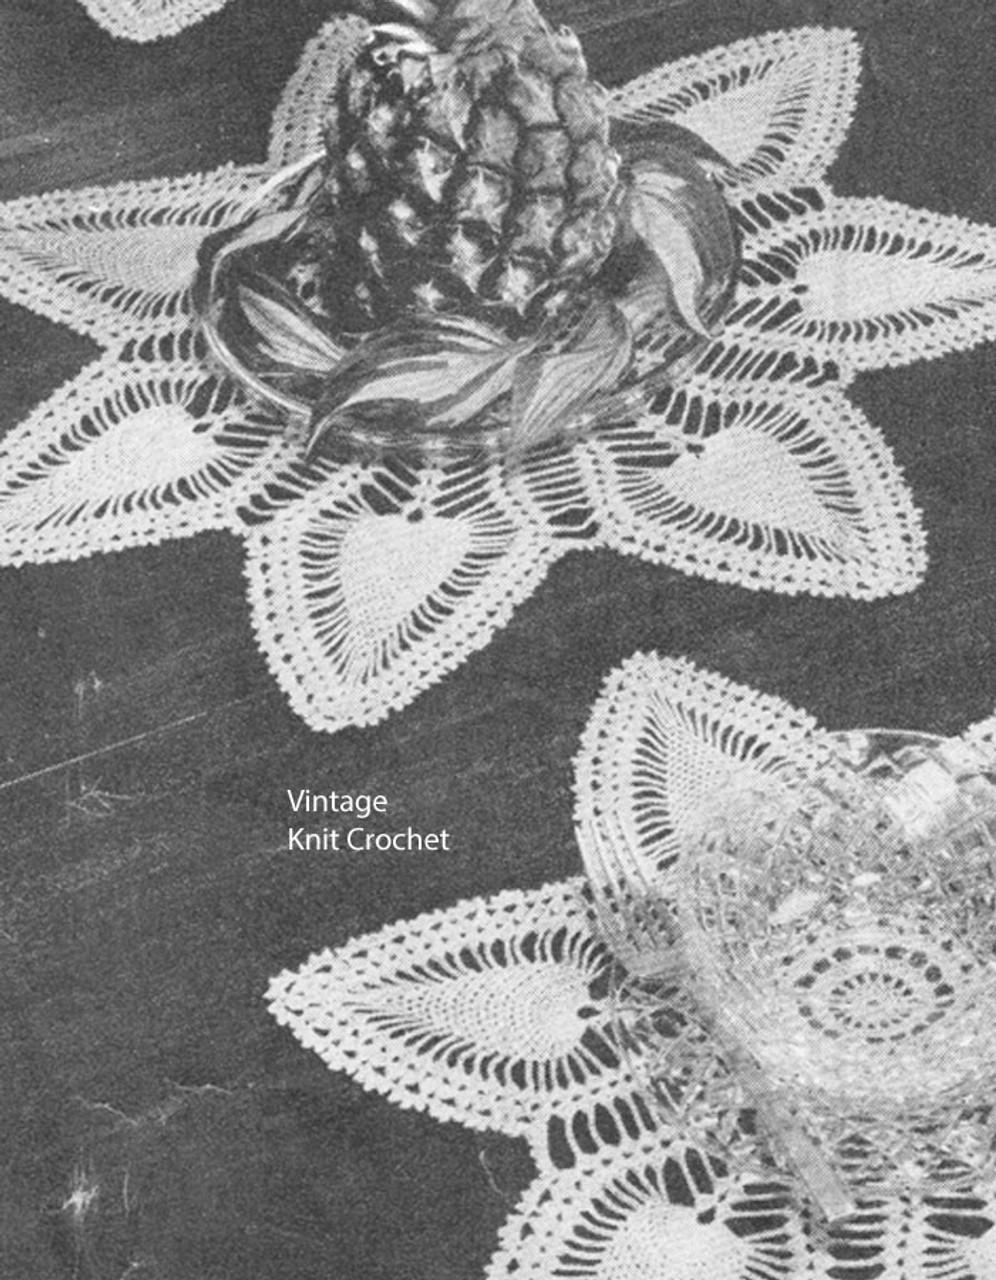 Vintage Crocheted Pineapple Mats Pattern